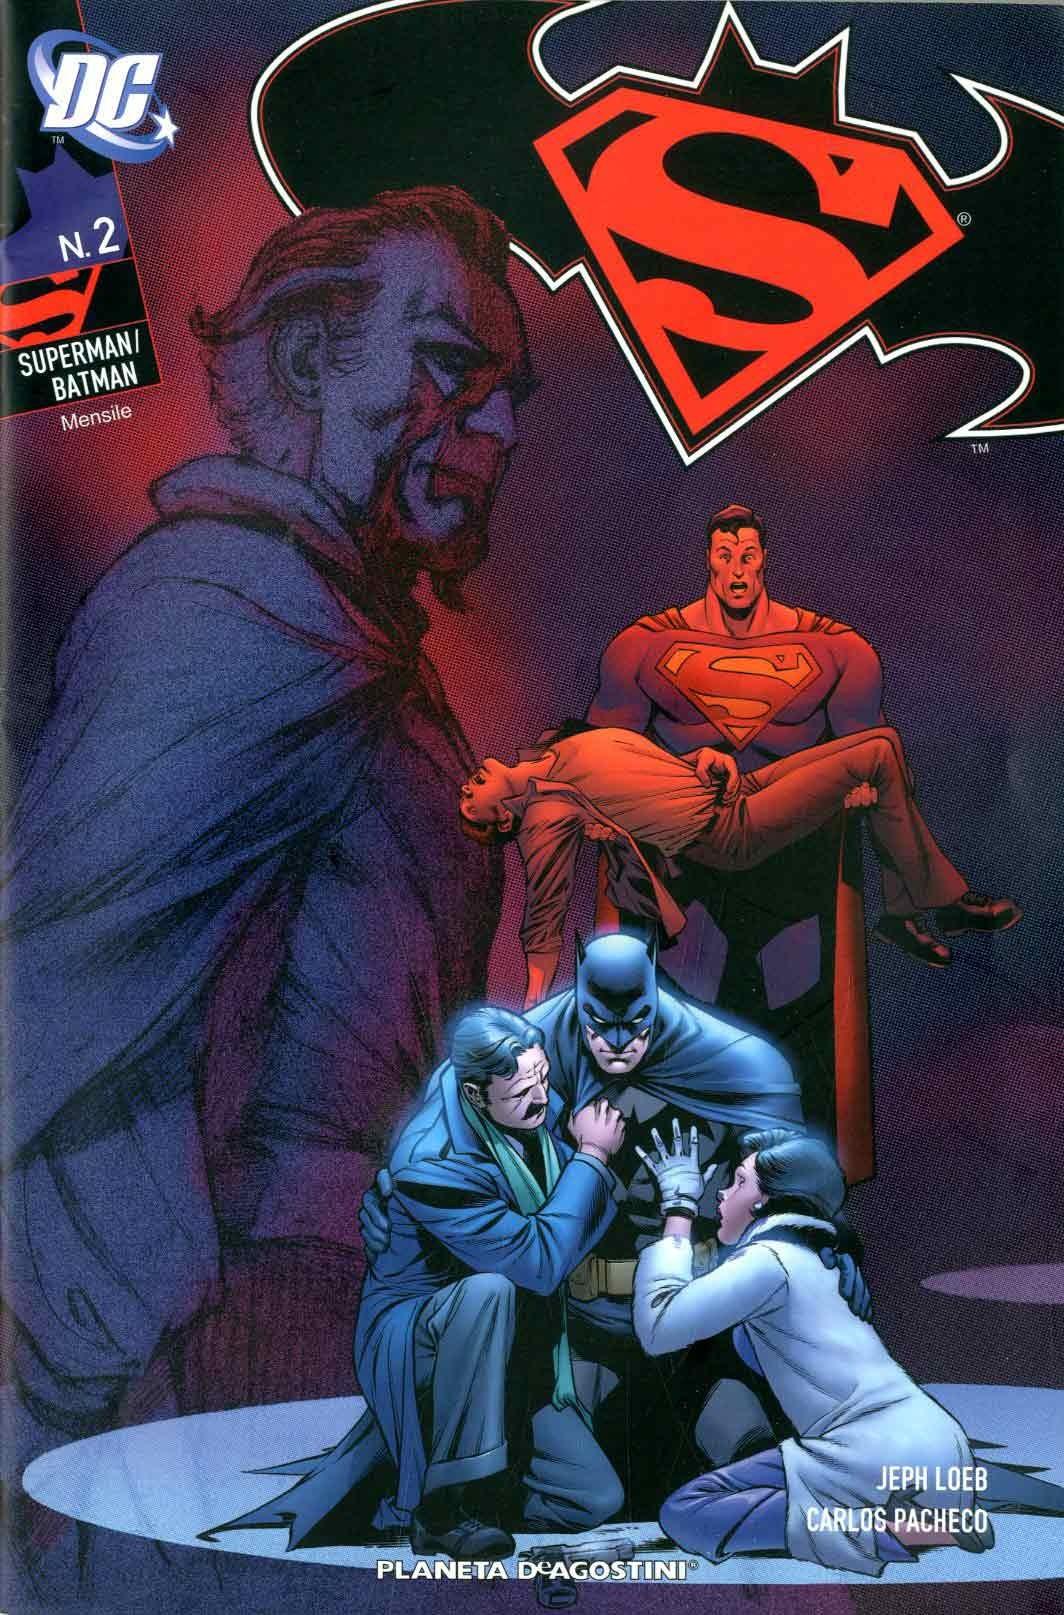 Superman Batman (M6) - N° 2 - Superman Batman - Planeta-De Agostini